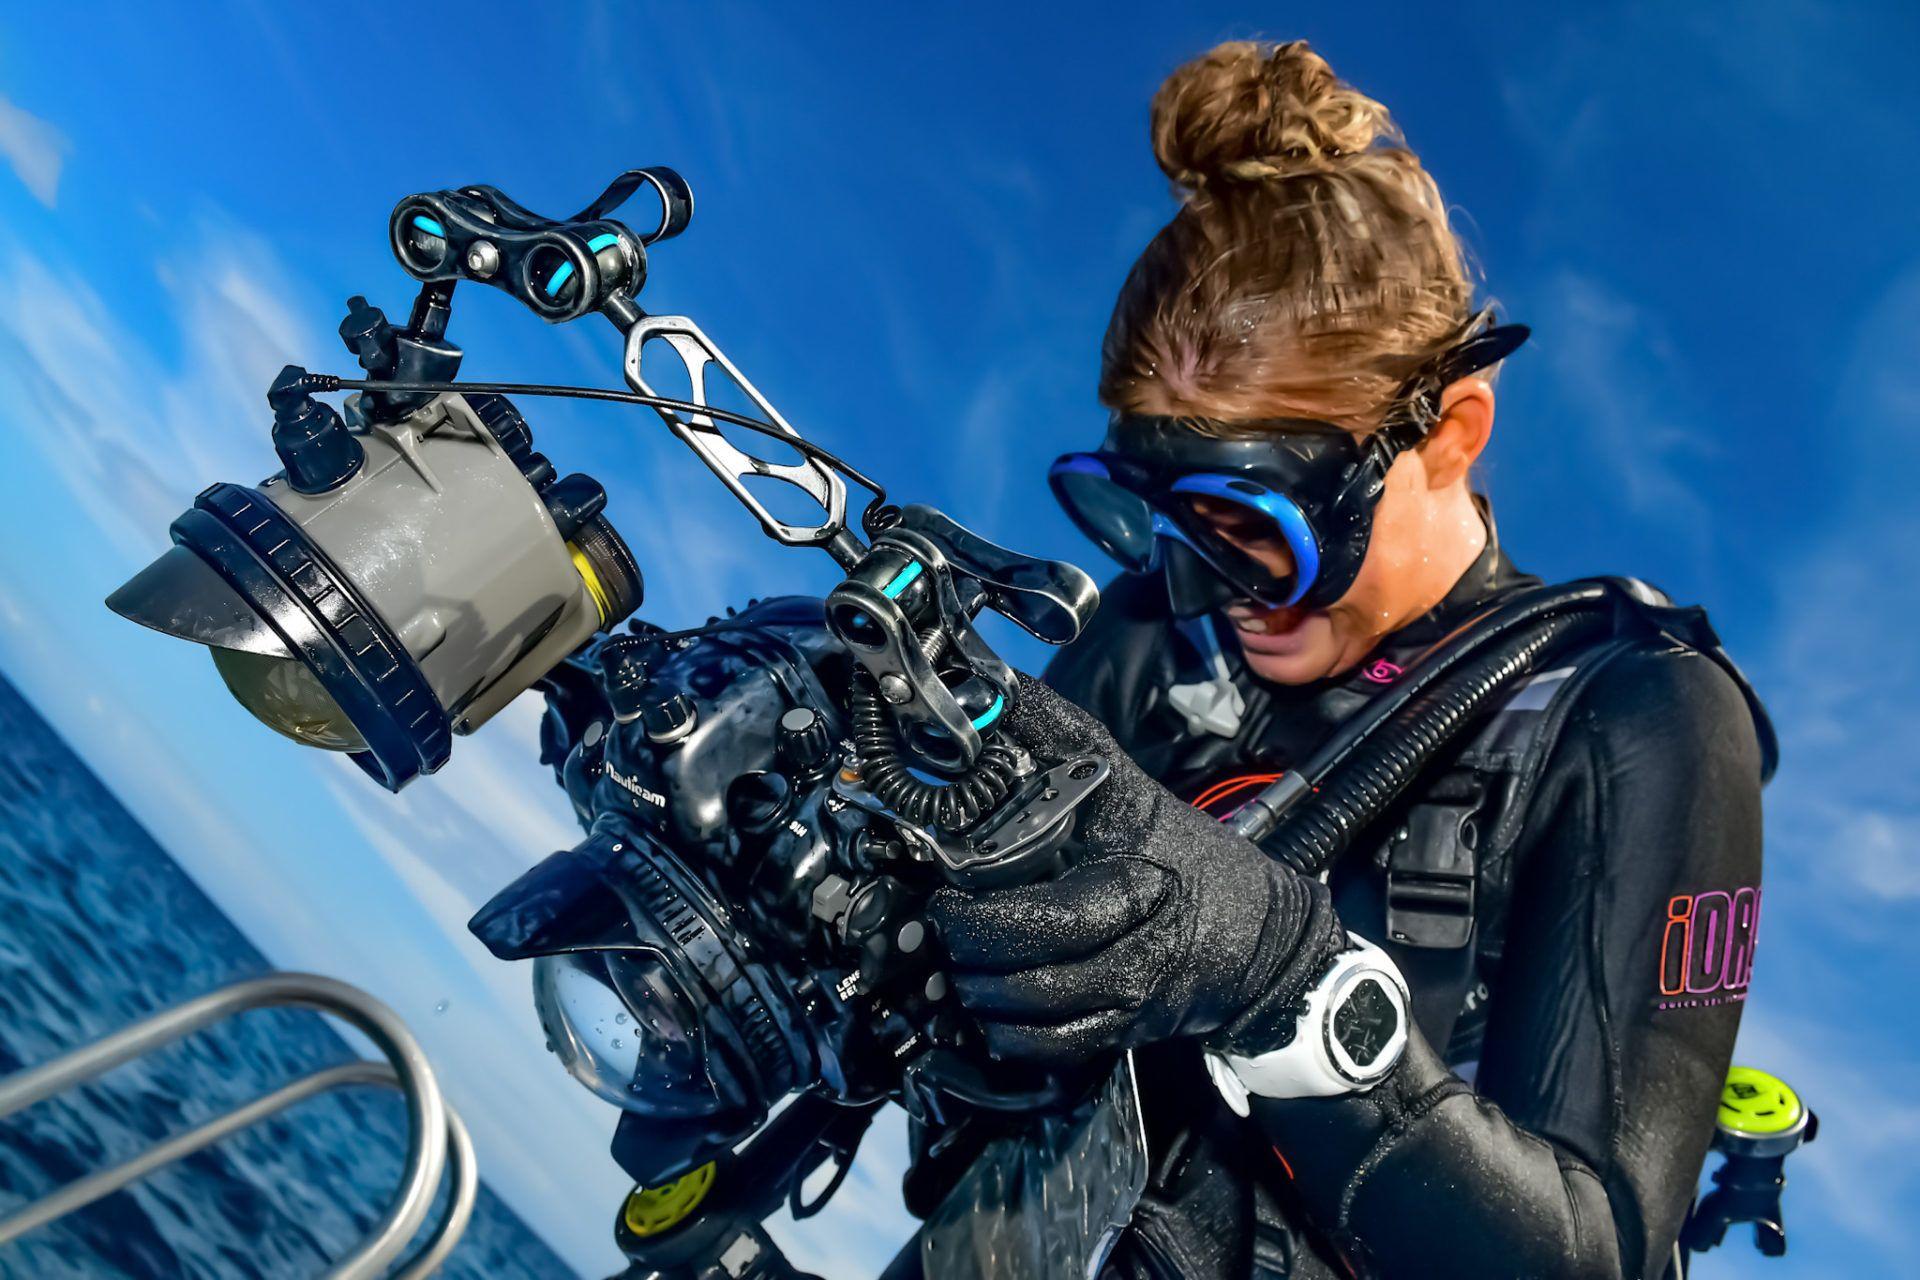 Underwater photographer Best Job in the World